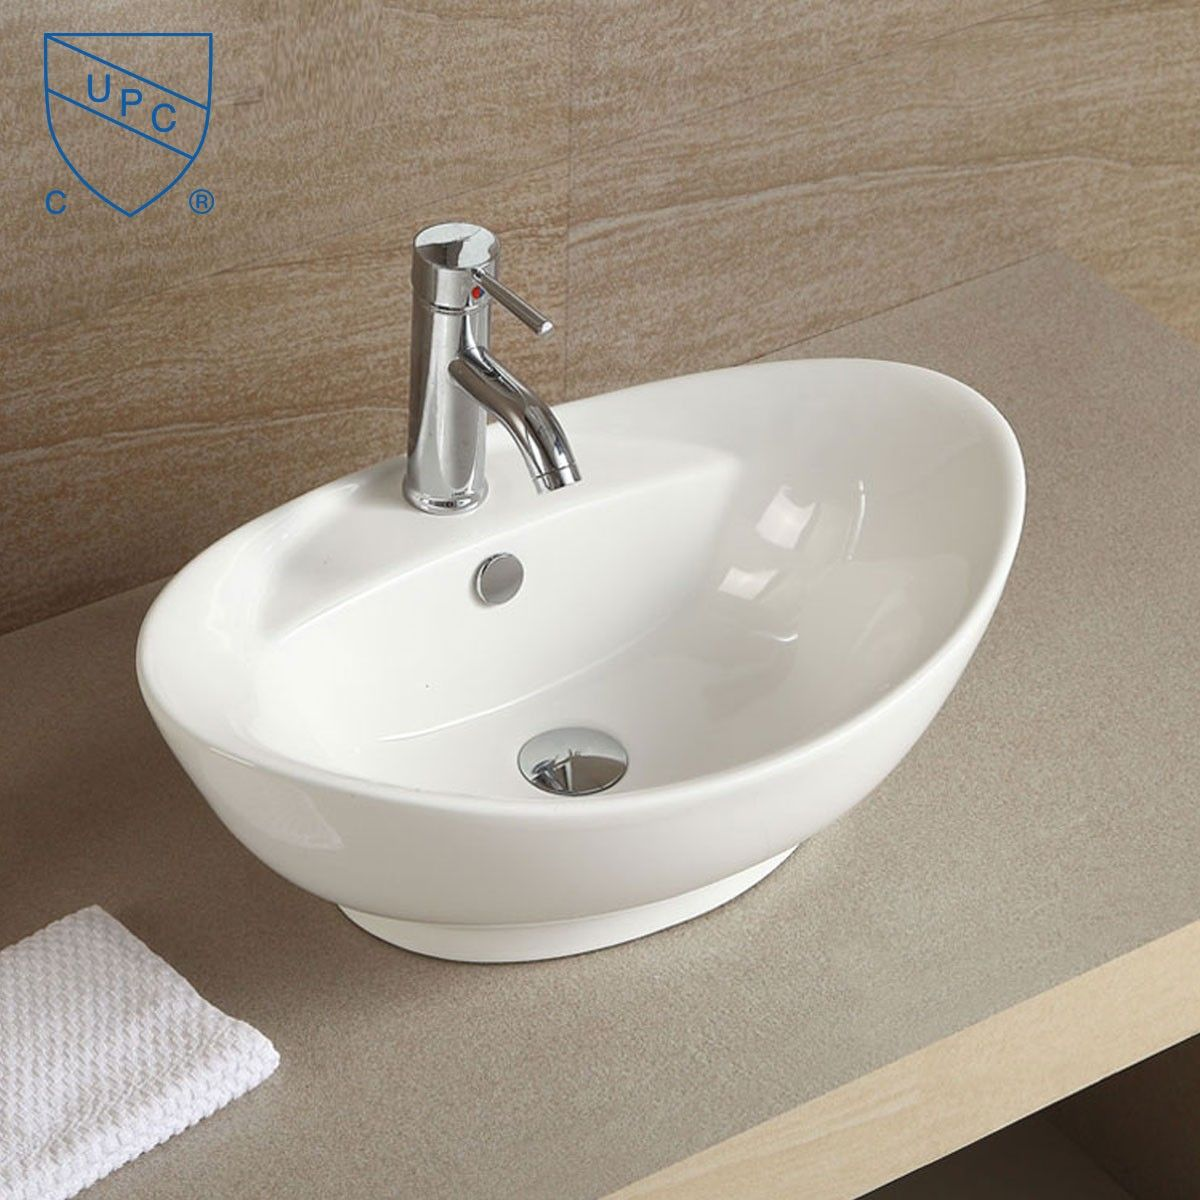 Decoraport white oval ceramic above counter vessel sink - Bathroom vanity with vessel sink sale ...